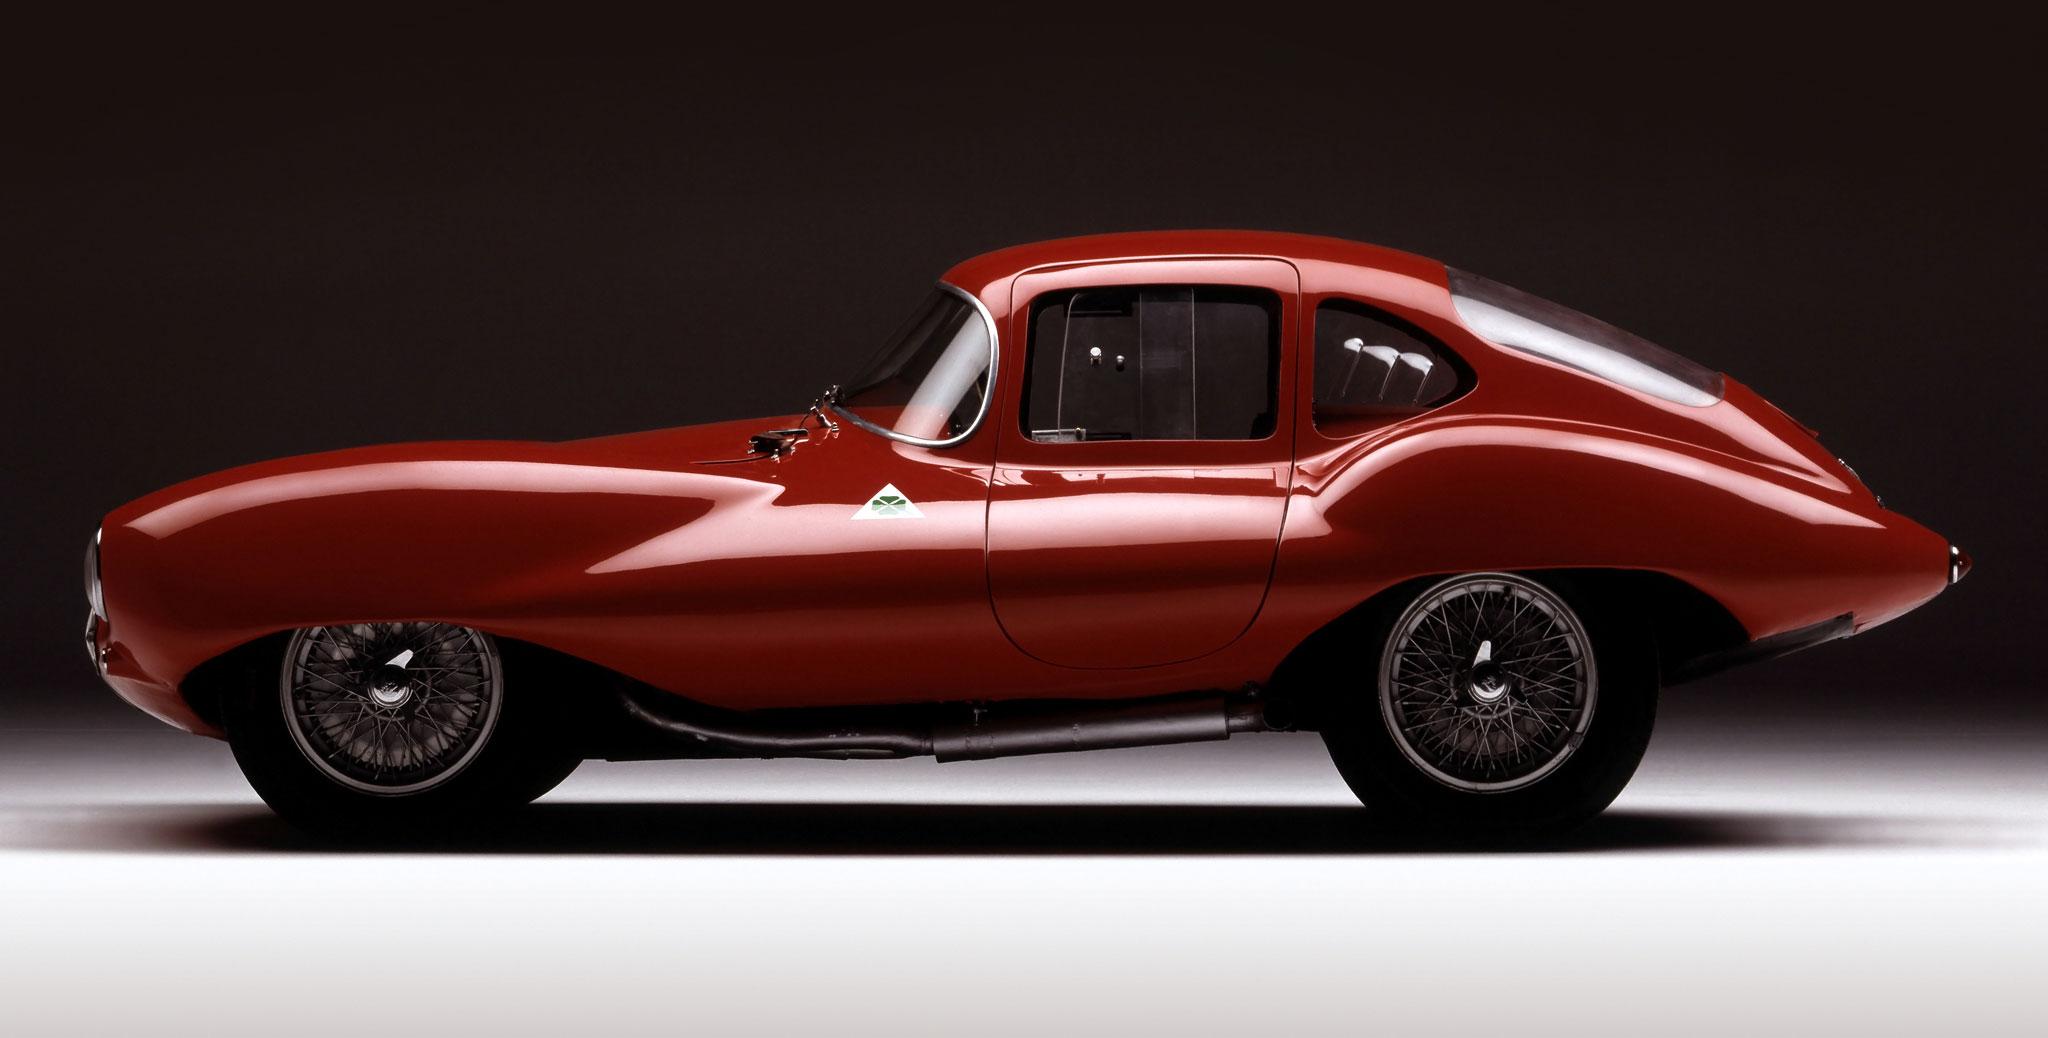 Index in addition 1900 C52 Disco Volante Side furthermore 181564 Customize Not 2 furthermore Alfa Romeo 6C in addition Watch. on alfa romeo superleggera